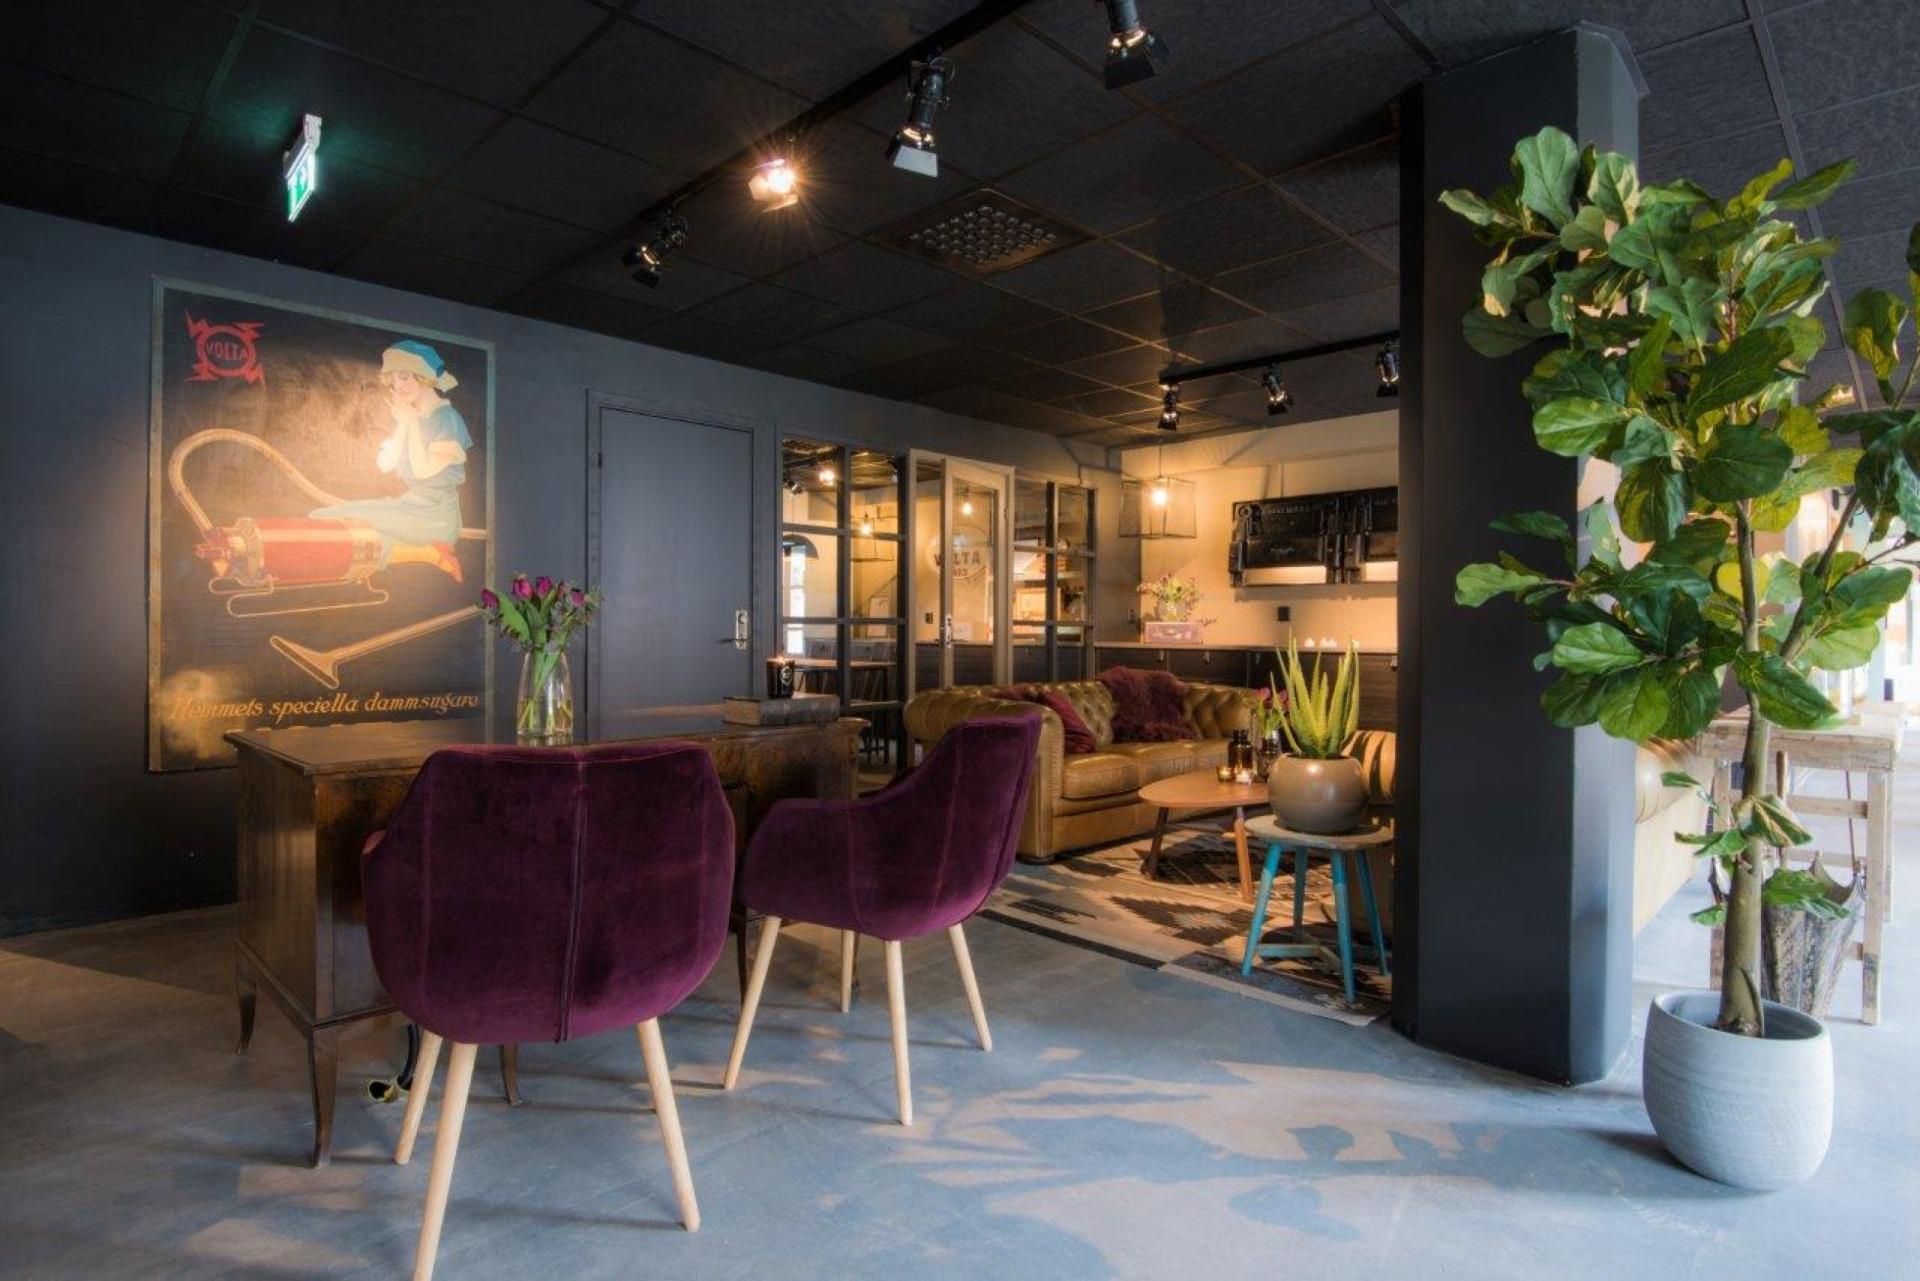 Reception at Voltavagen Apartment - Citybase Apartments